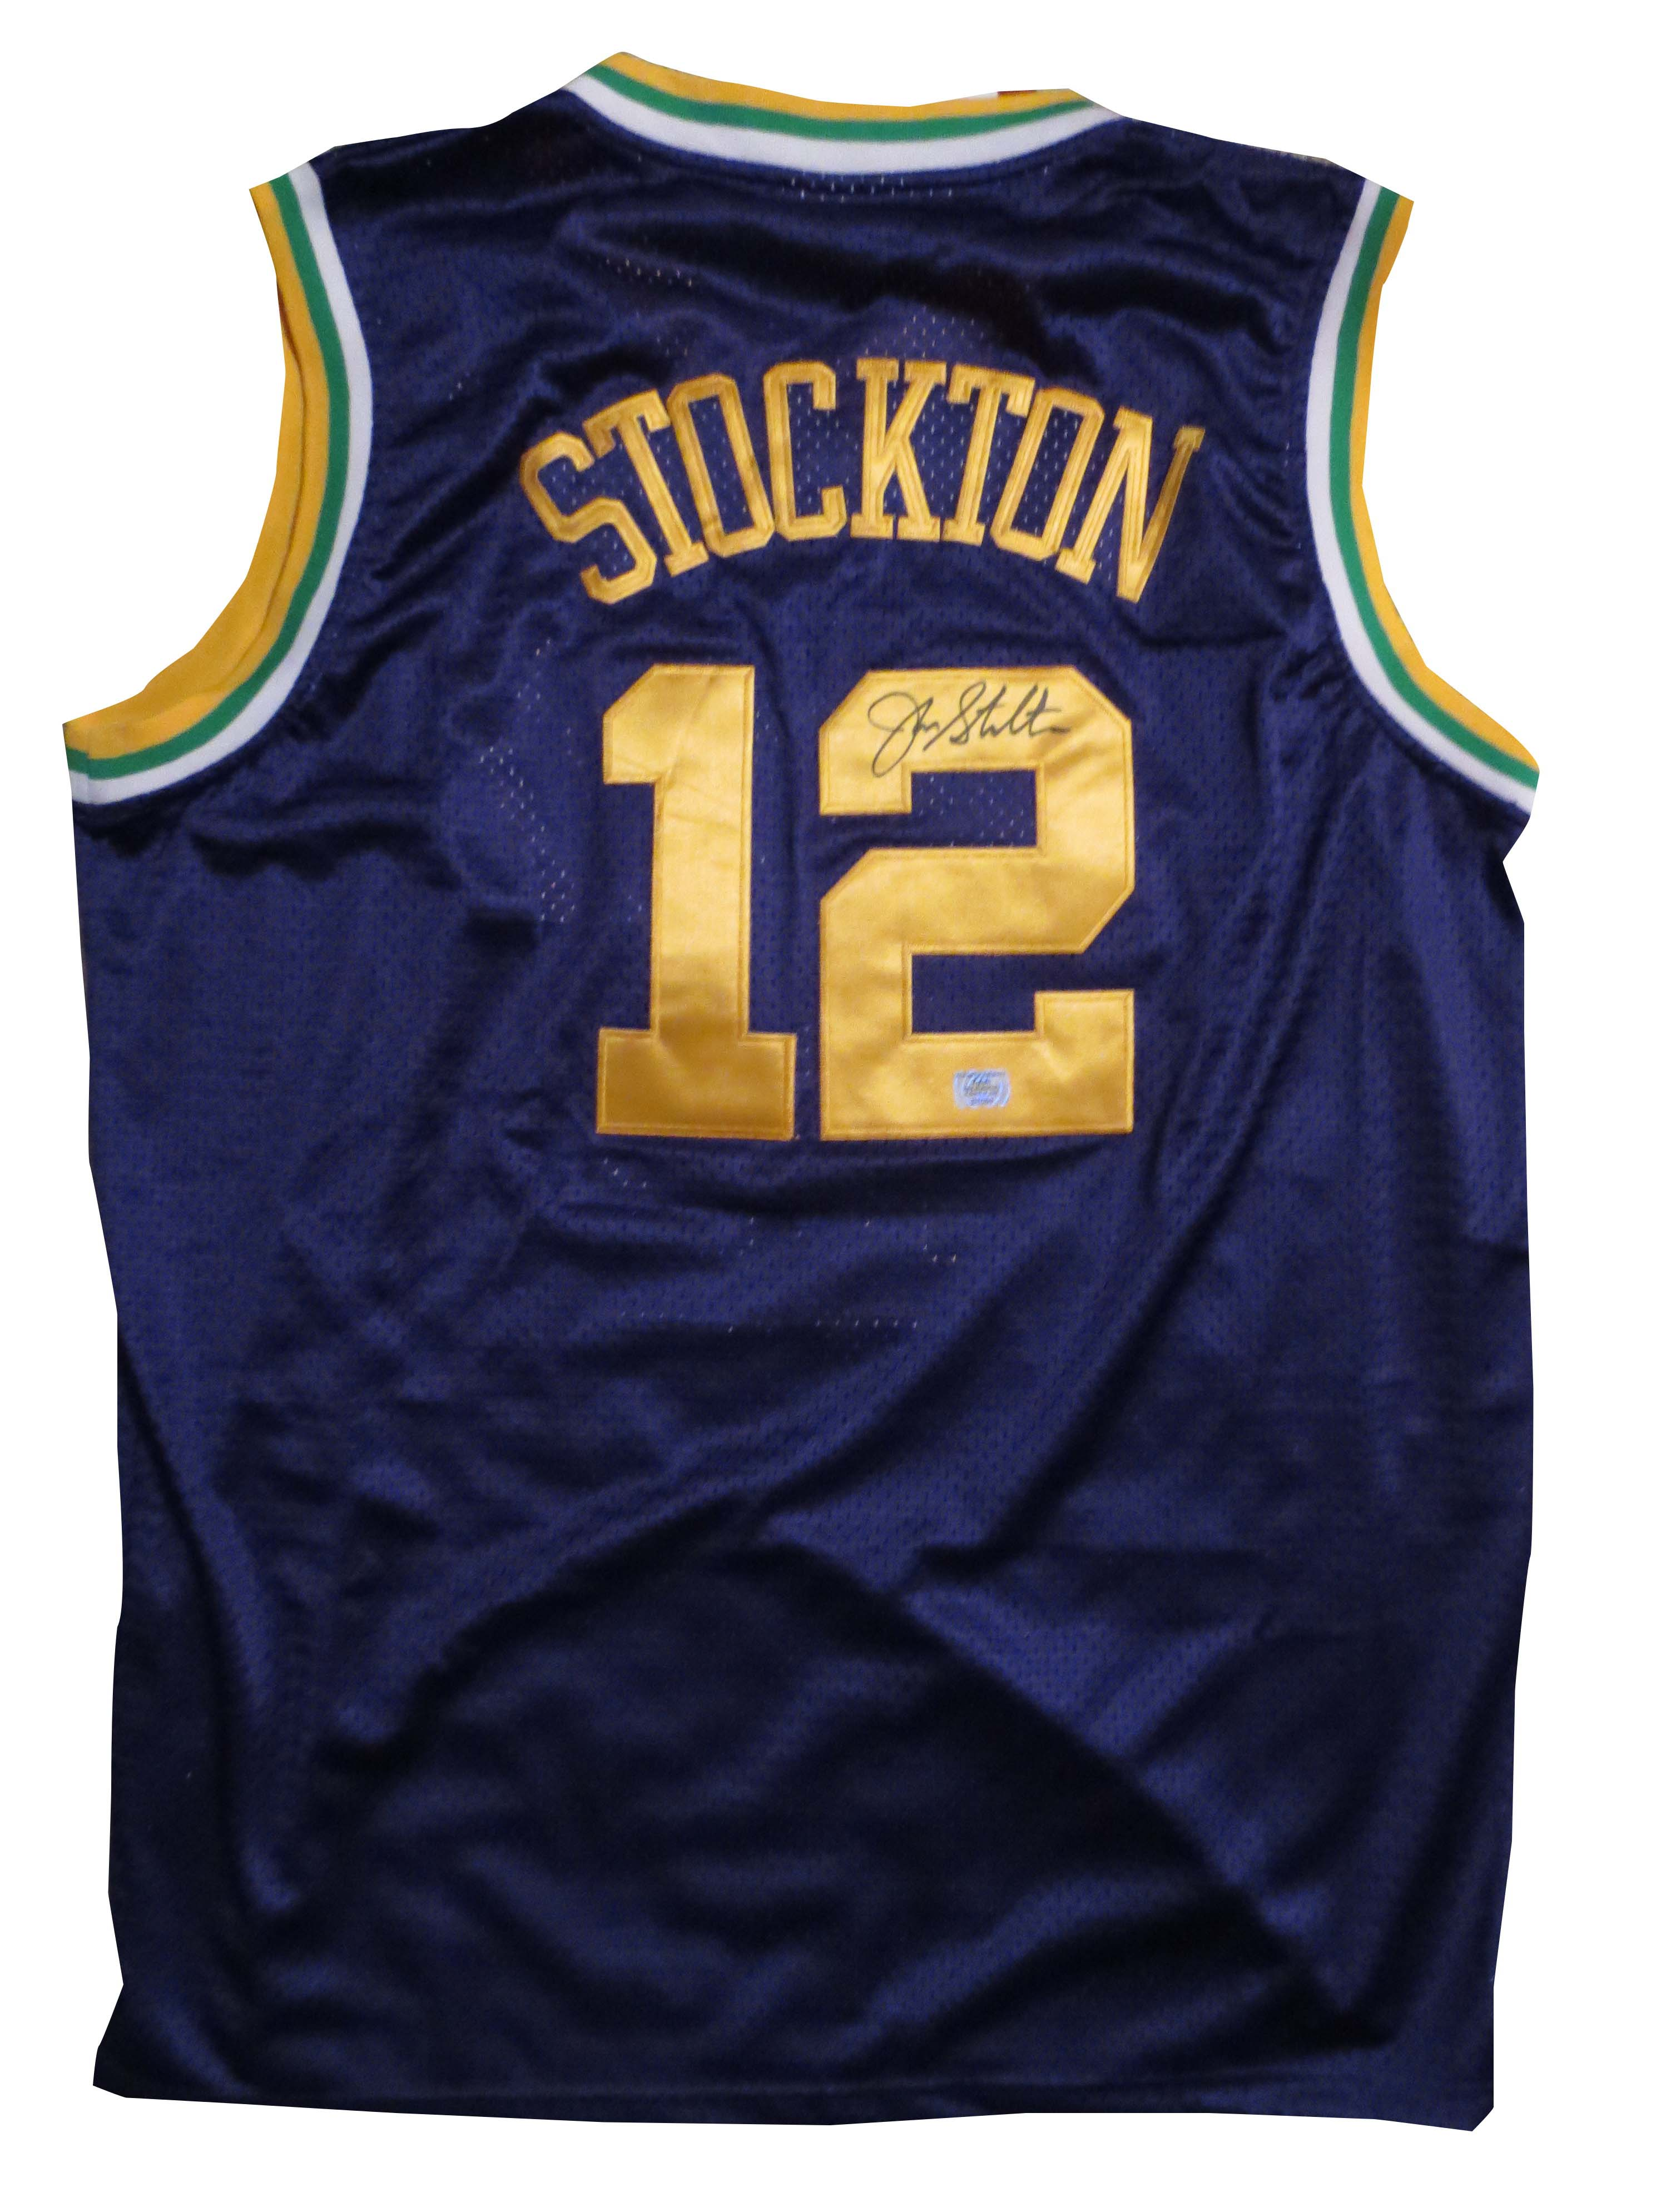 newest b6104 00635 John Stockton Signed Jazz Jersey from Powers Autographs